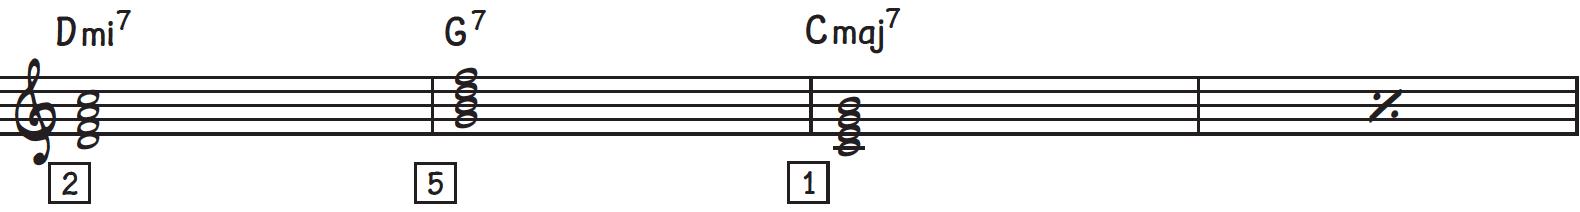 A 2-5-1 (ii-V-I) chord progression in C major